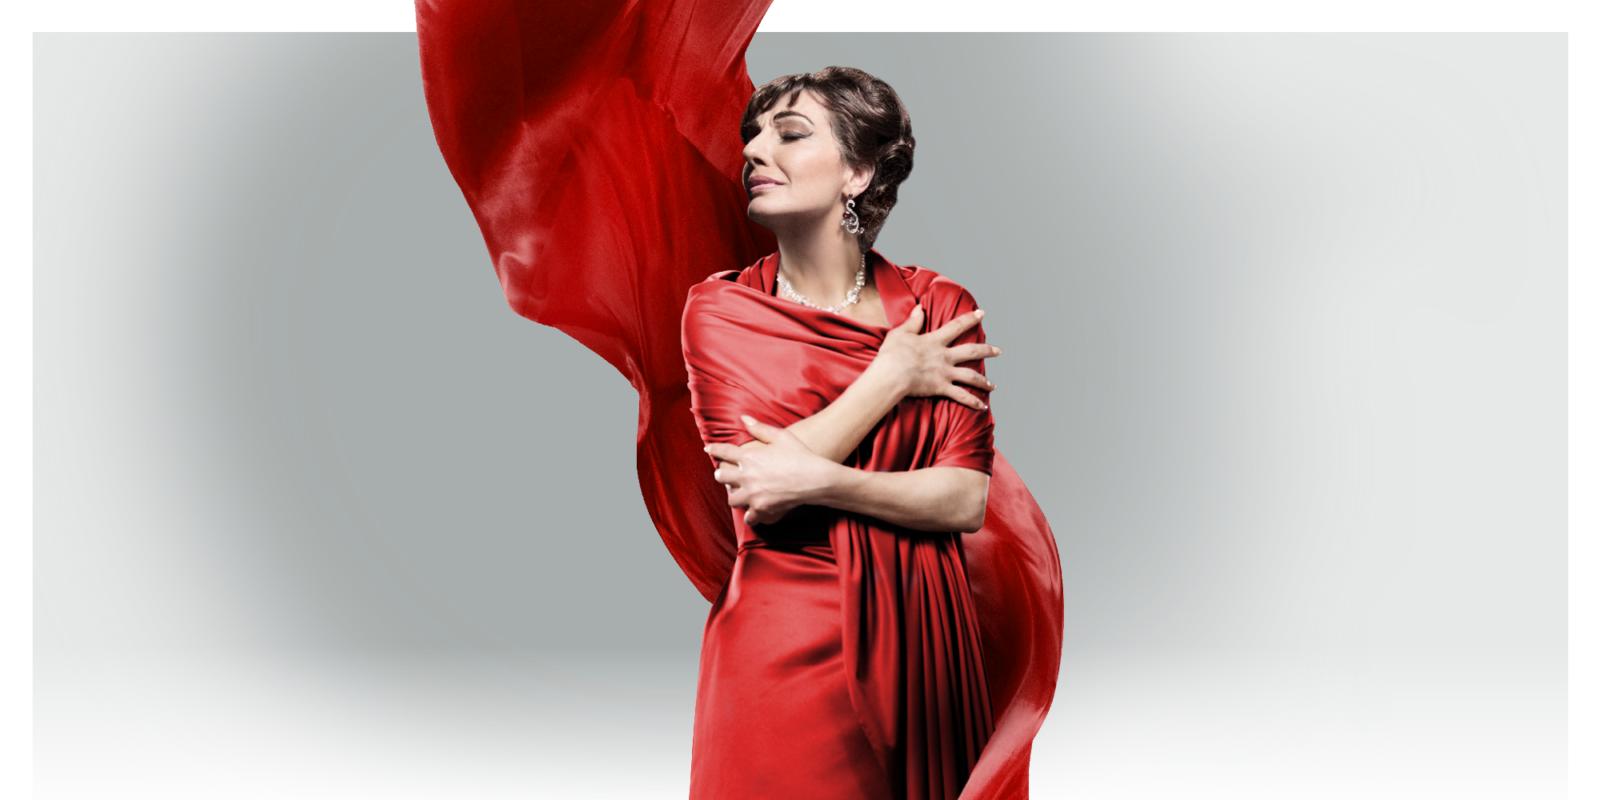 Callas in Concert - The Hologram Tour